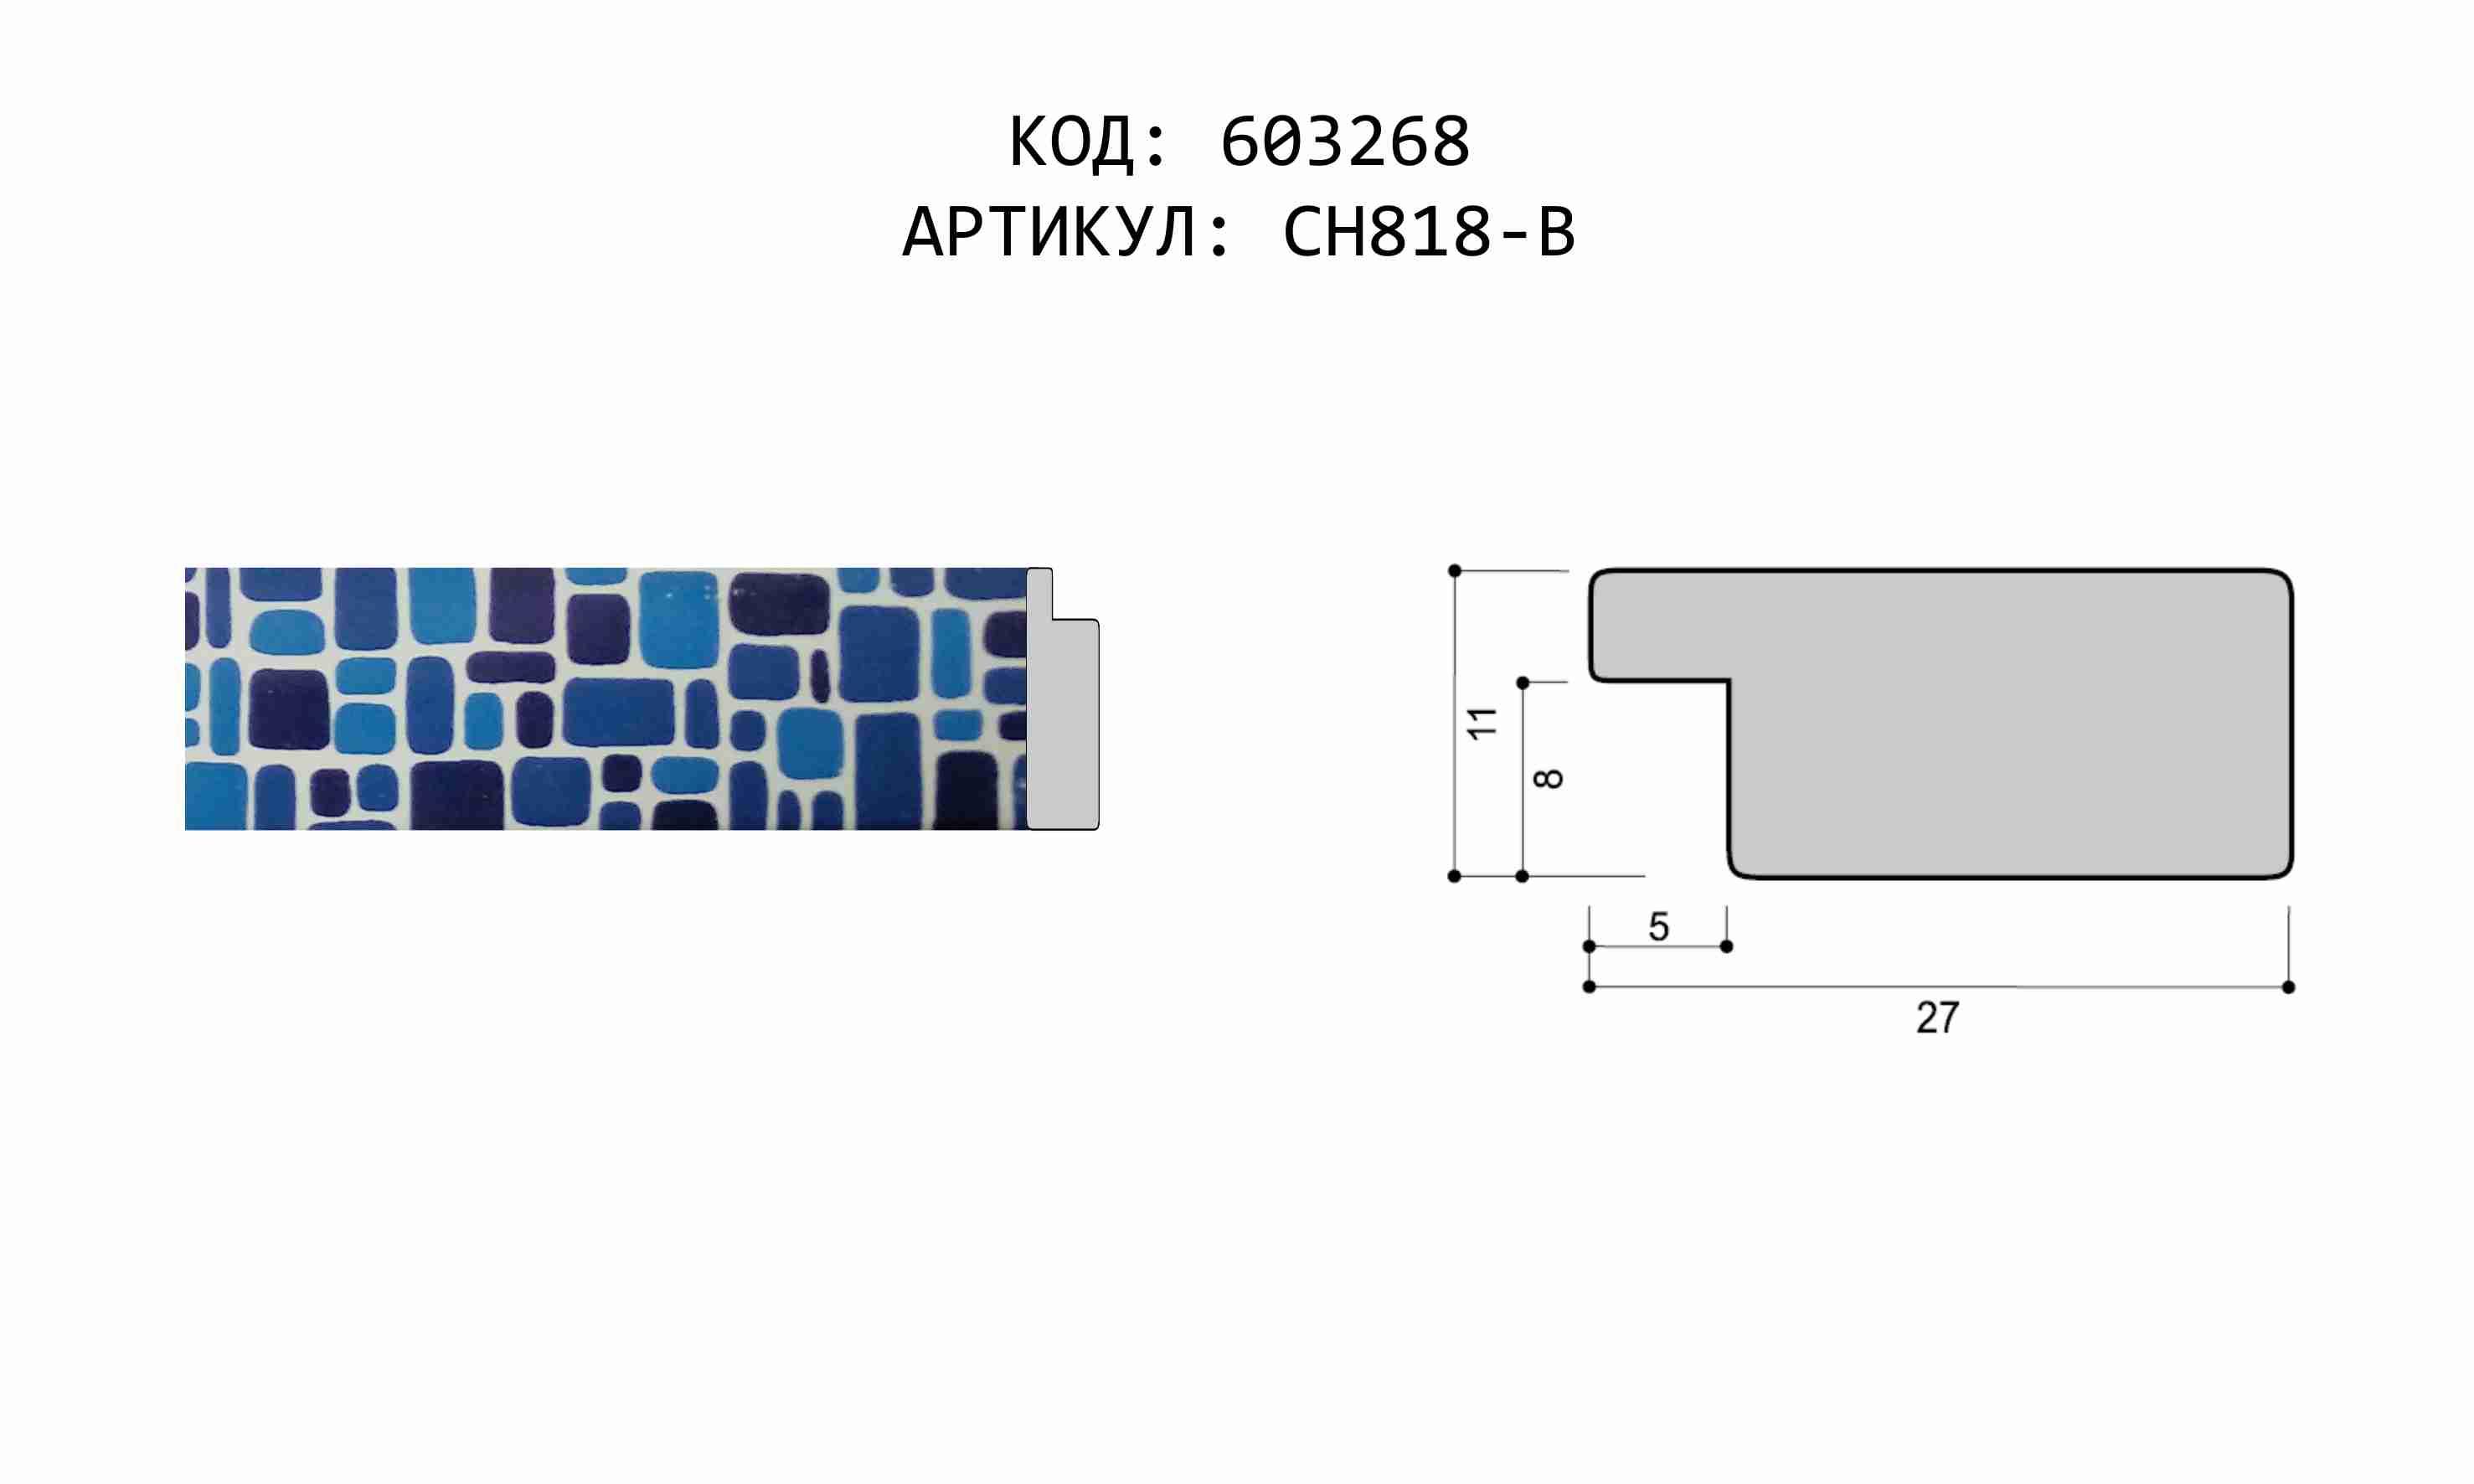 Артикул: CH818-B